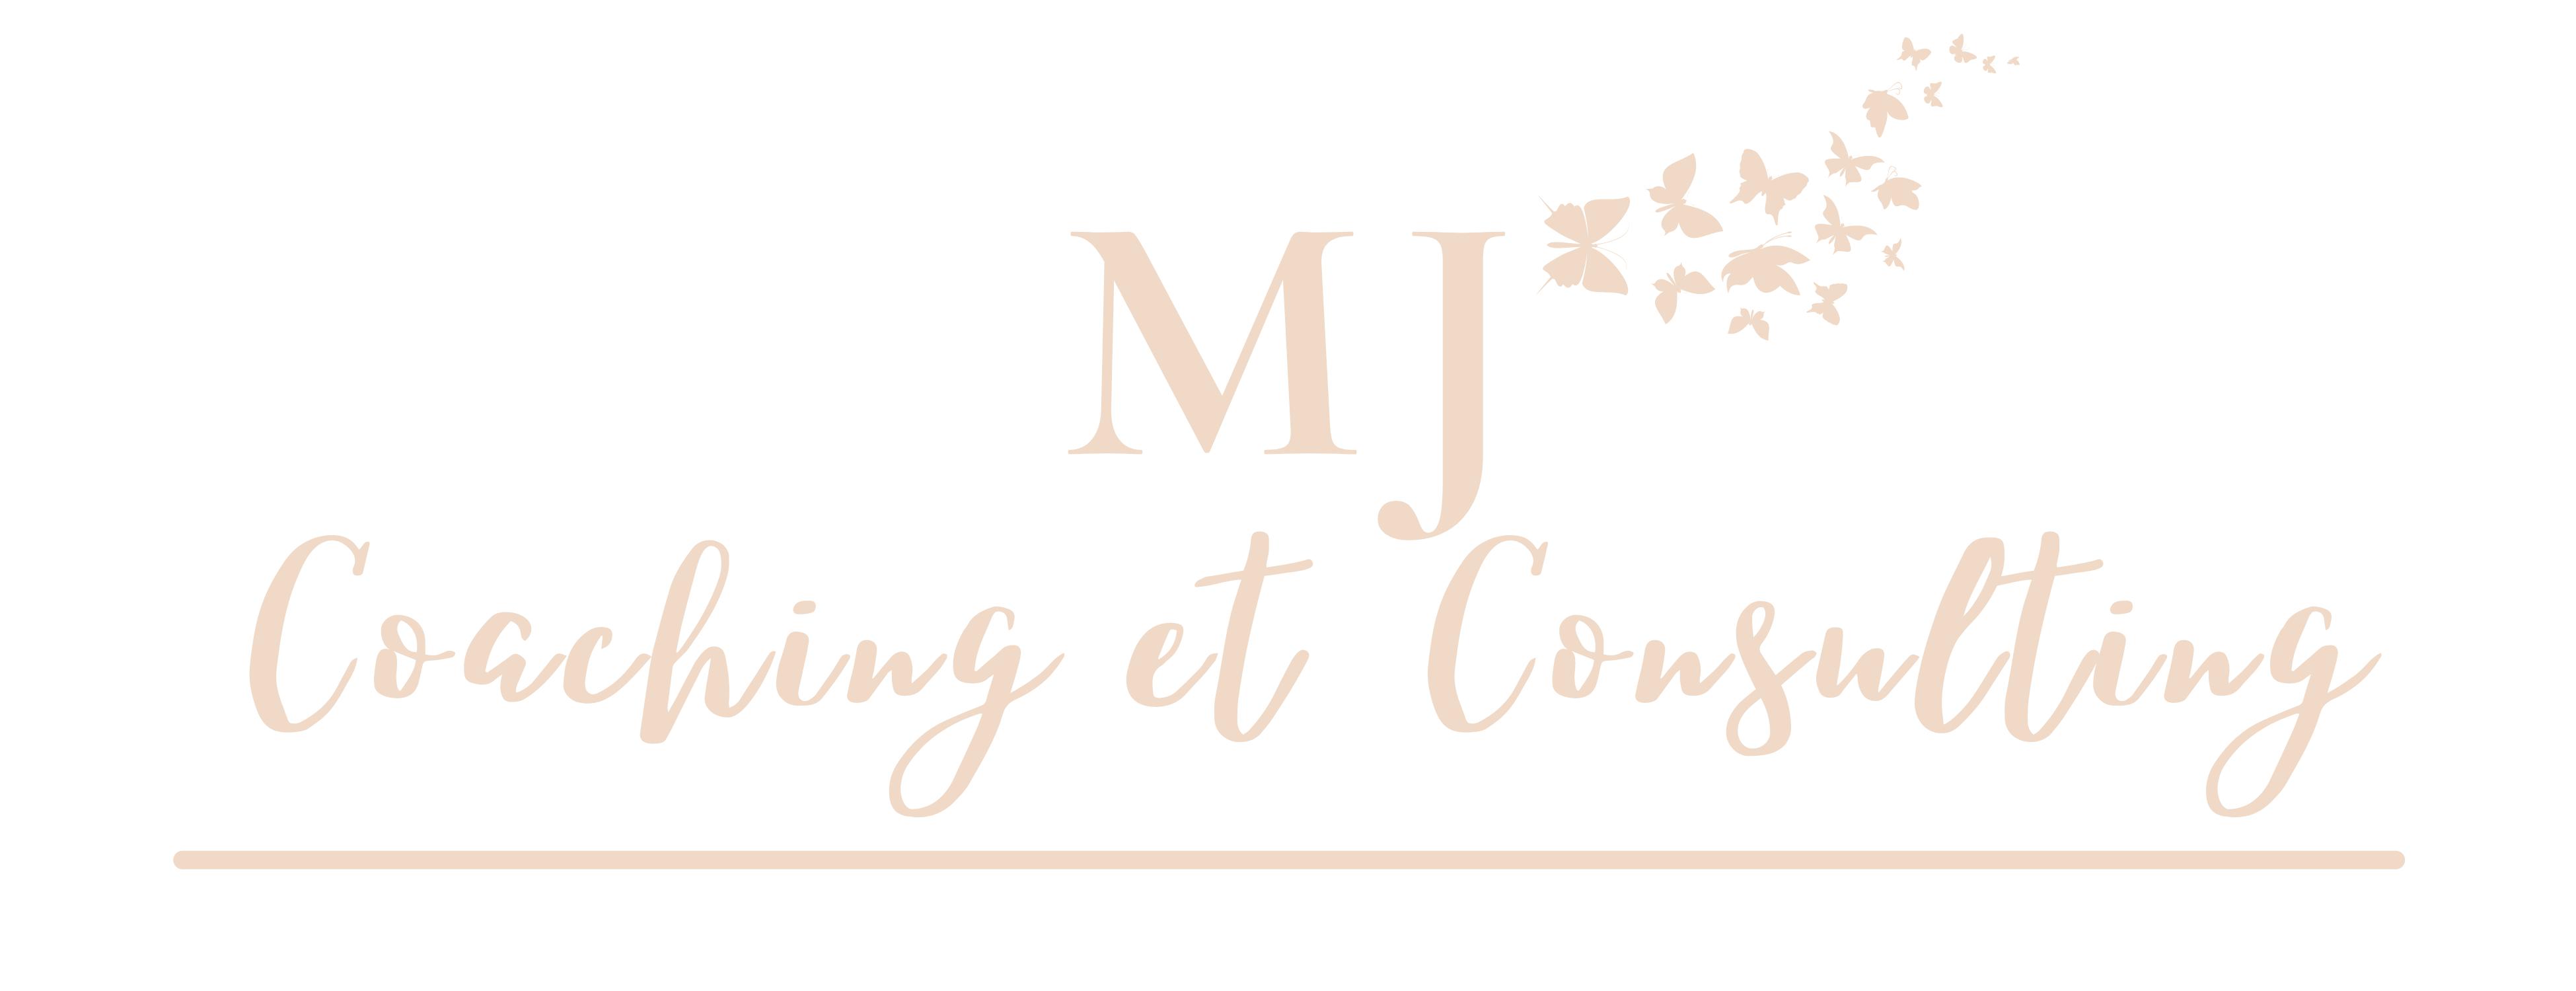 MJ Coaching et Consulting